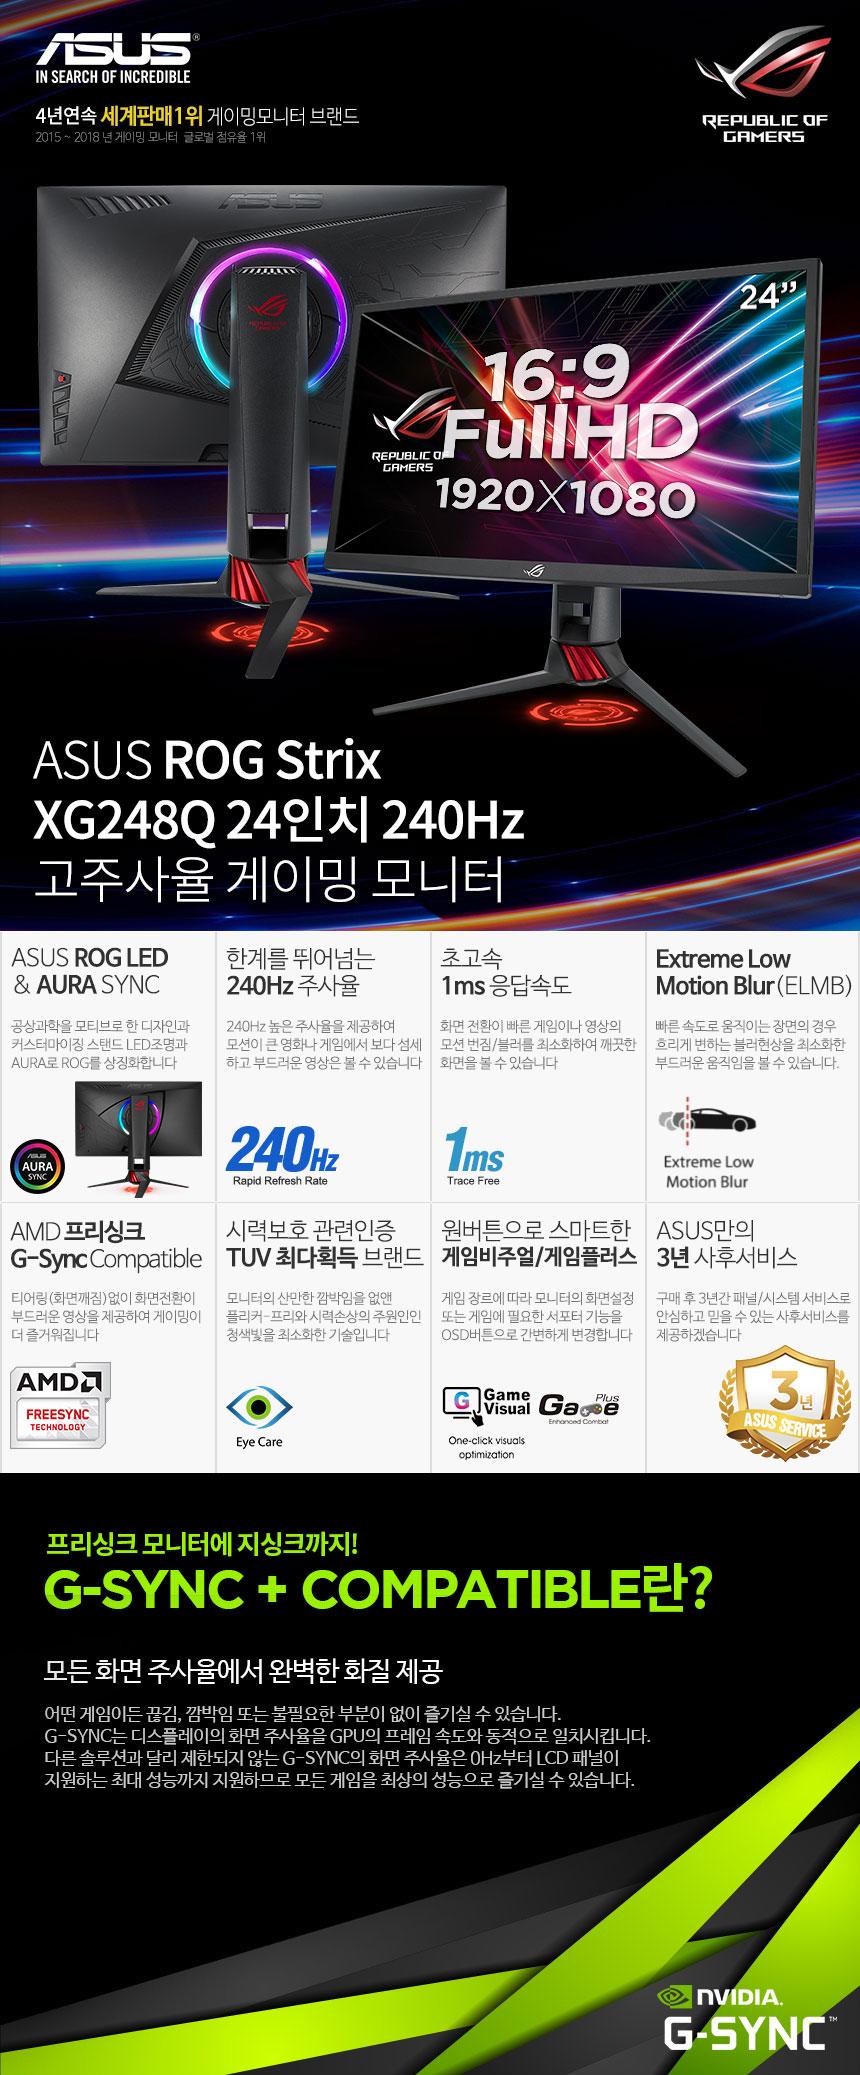 ASUS ROG STRIX XG248Q